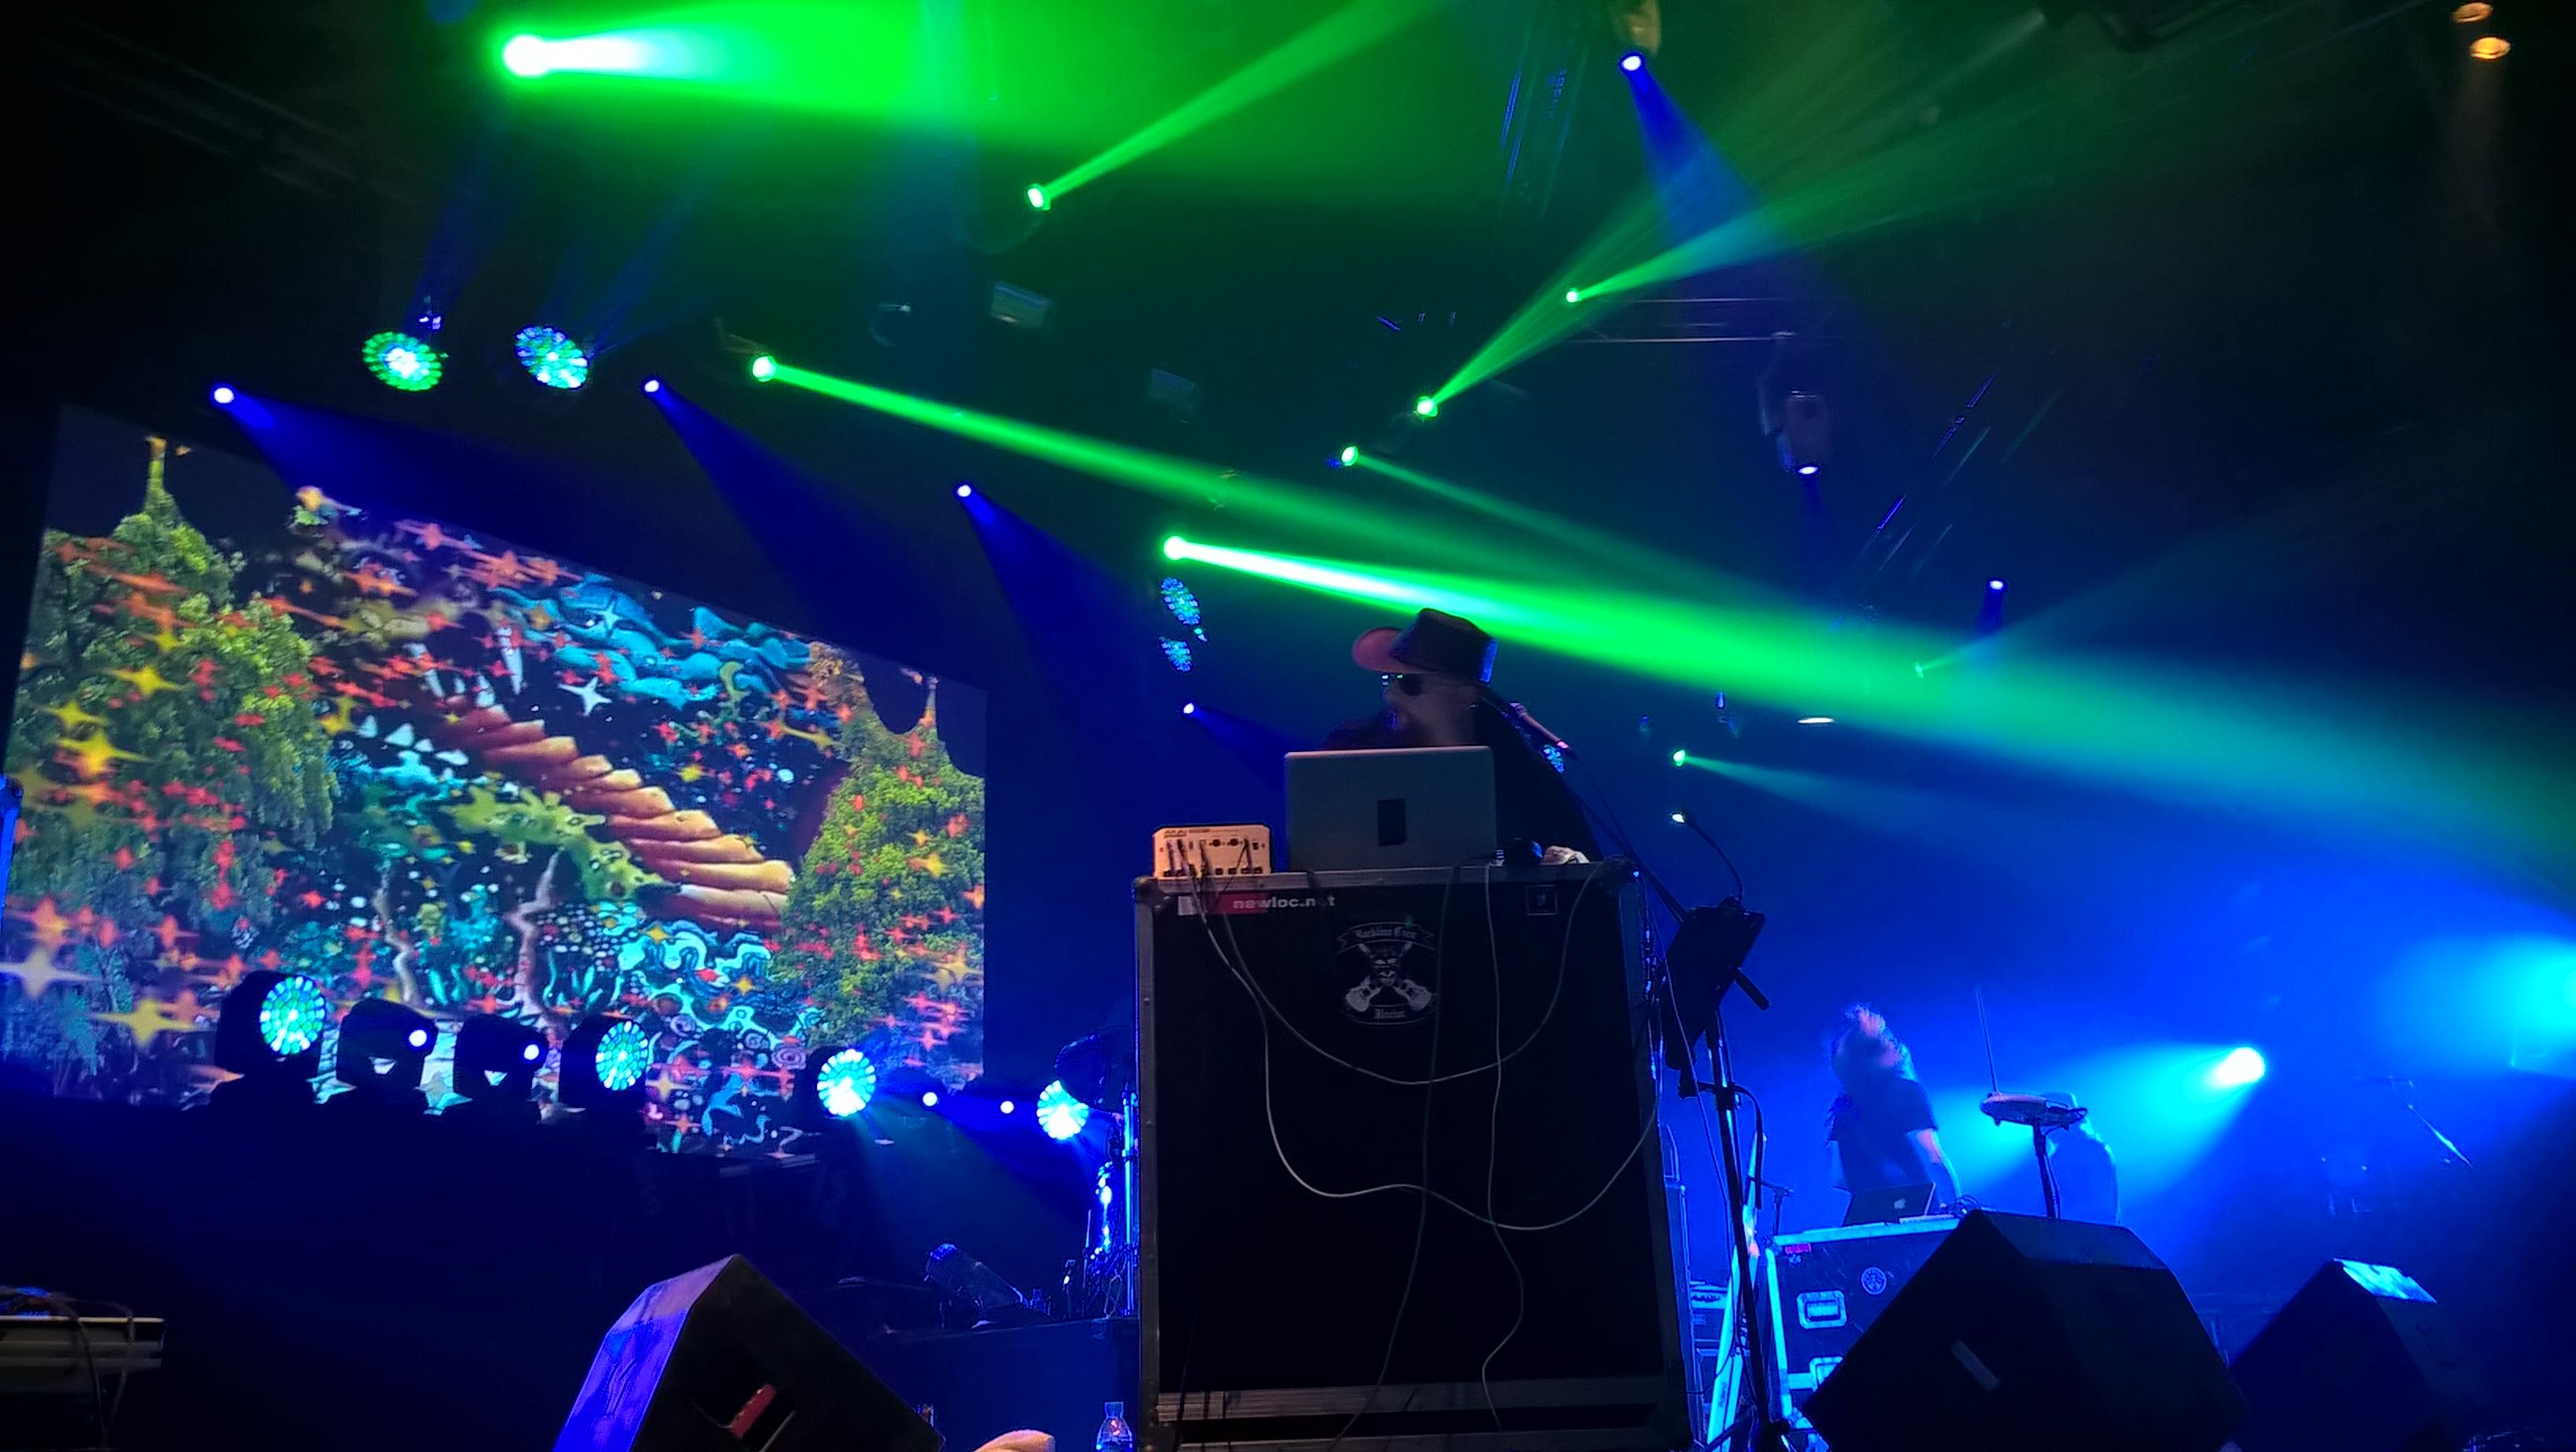 Magnus Martin et les lights show d'Hawkwind/ Hellfest-Clisson/ 18 juin 2017. photo Ziggy/weirdsound/